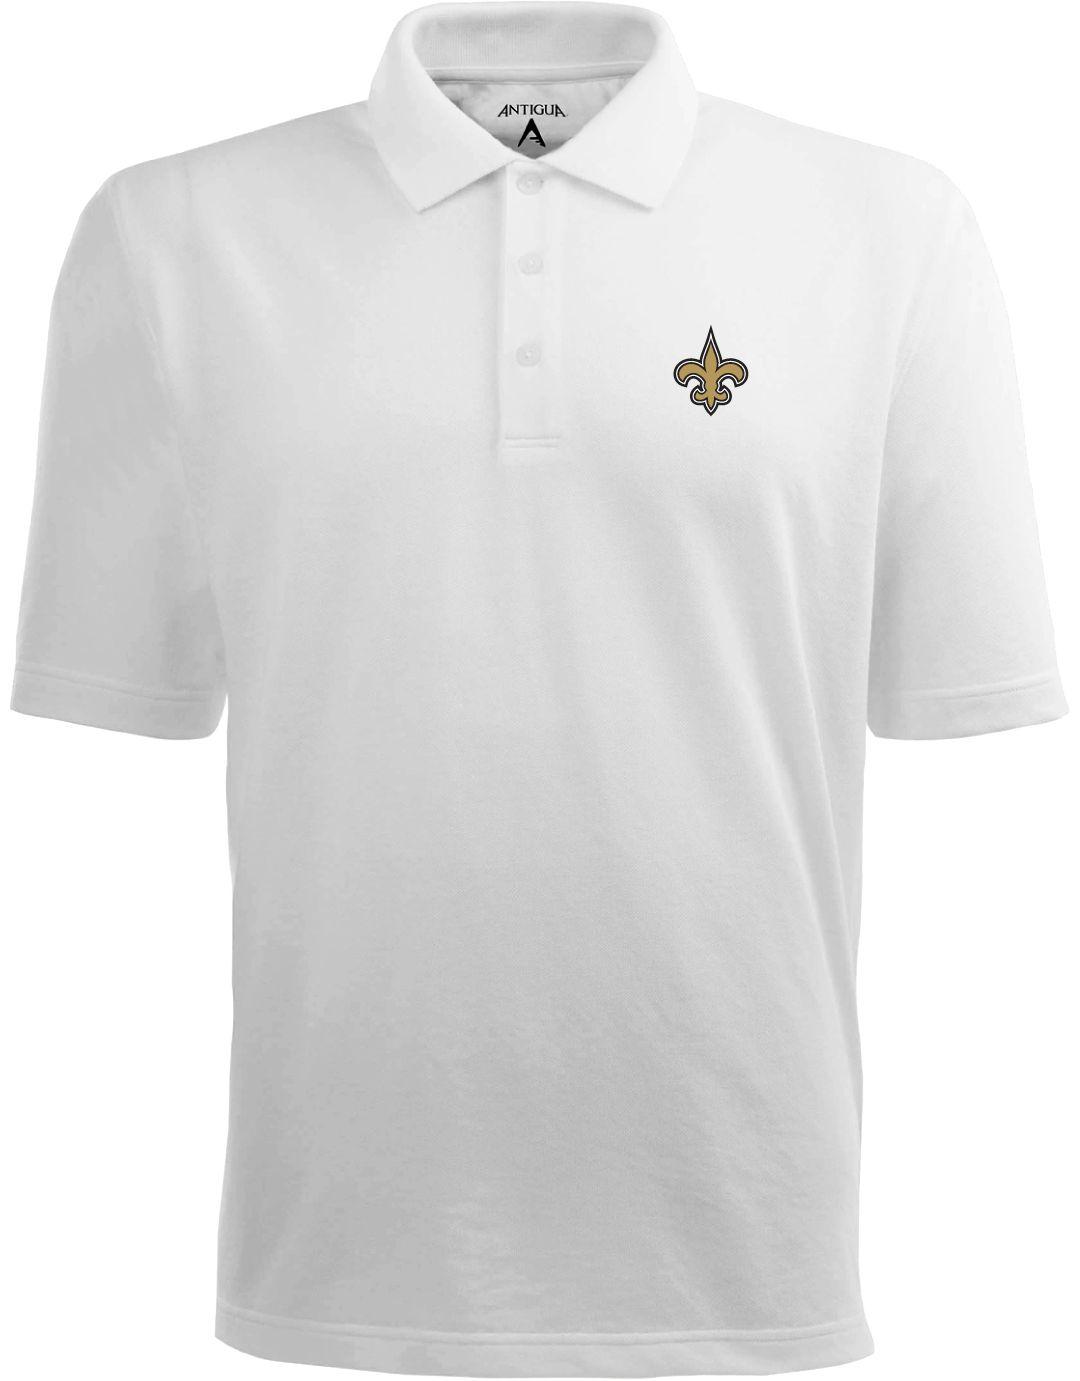 pretty nice c5efa 4038c Antigua Men's New Orleans Saints Pique Xtra-Lite White Polo